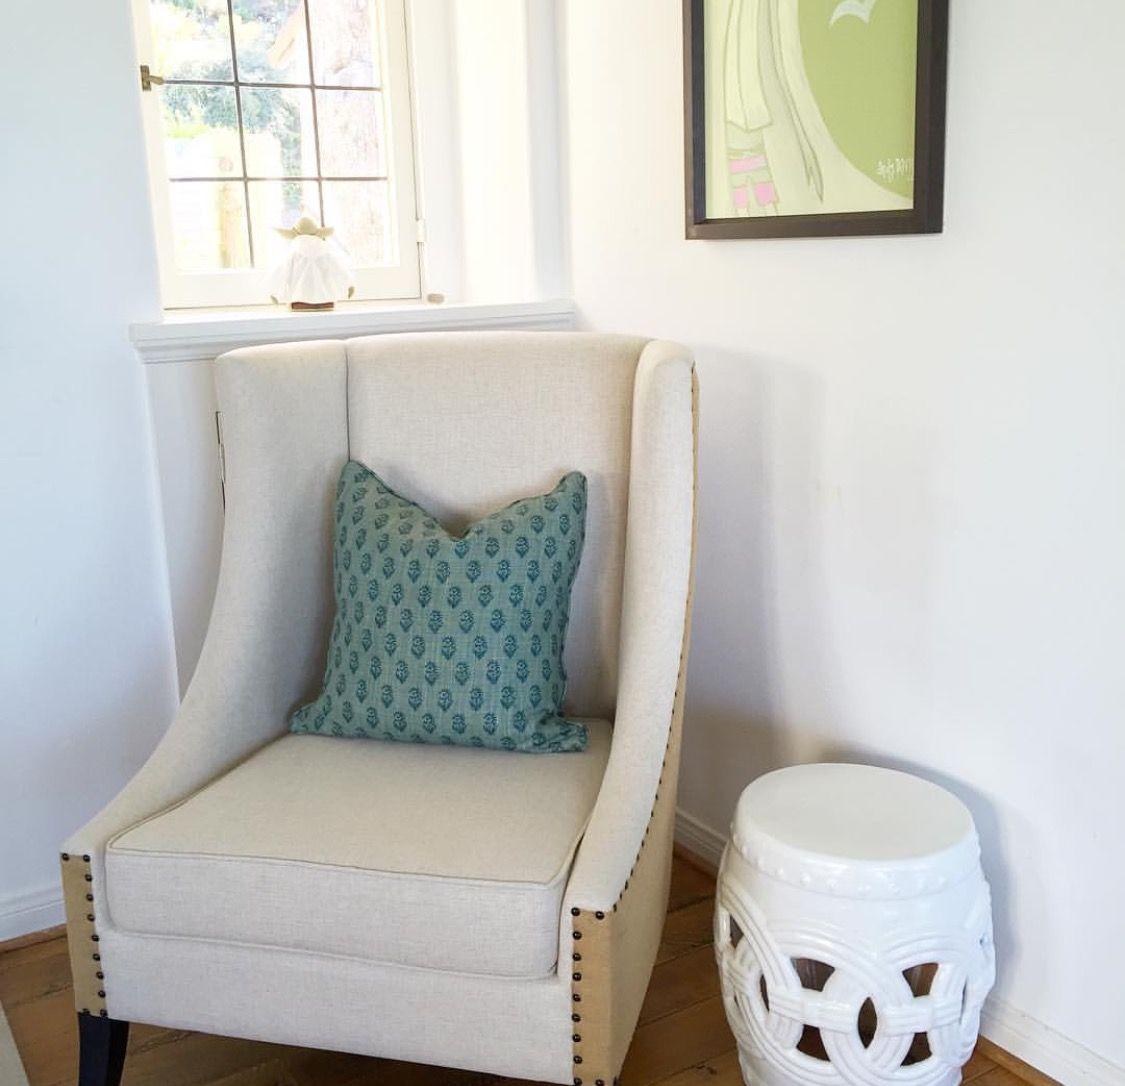 Peter Dunham Rajmata tonal blue/blue pillow Noir chair Wisteria garden stool by & Peter Dunham Rajmata tonal blue/blue pillow Noir chair Wisteria ... islam-shia.org